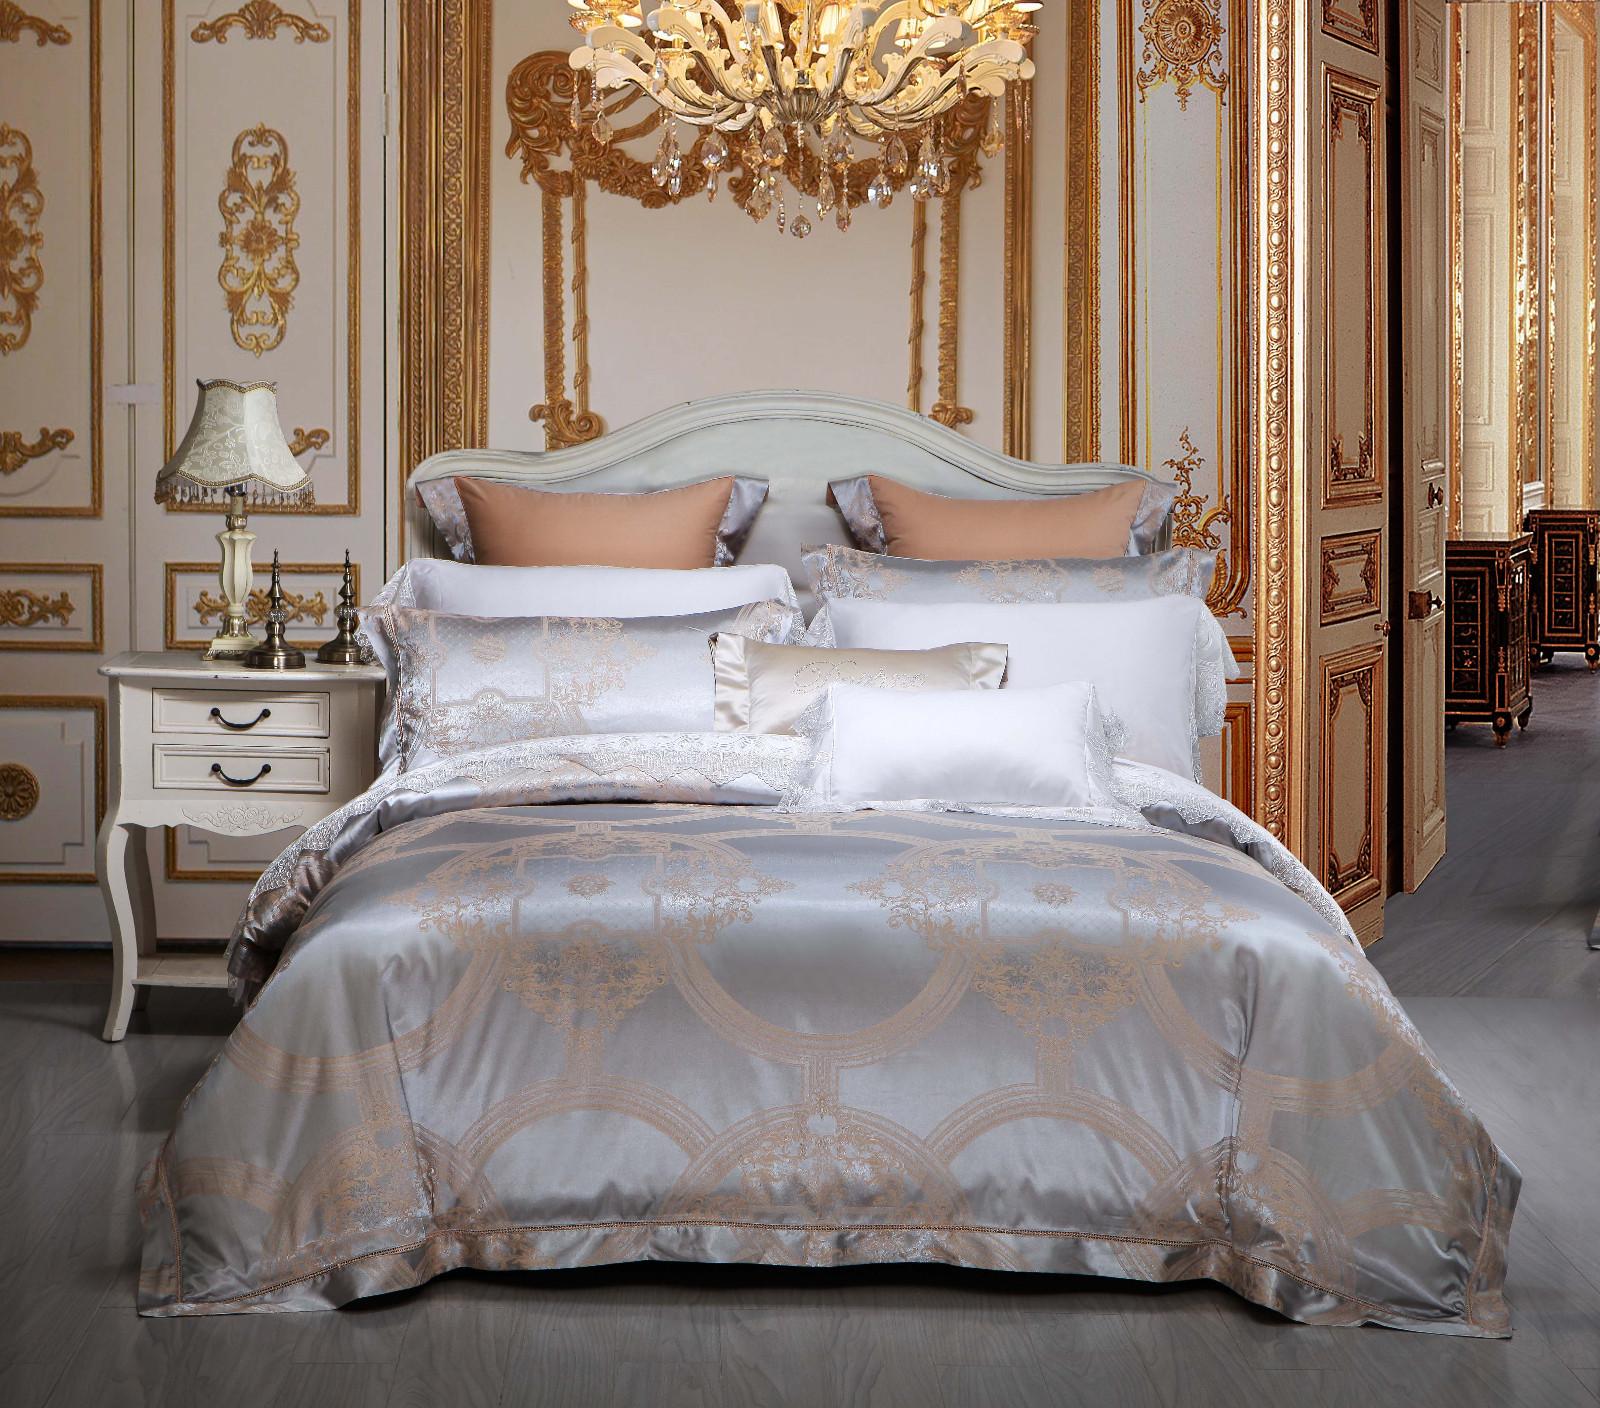 Daphne jacquard duvet cover king sheet bed attractive bedroom